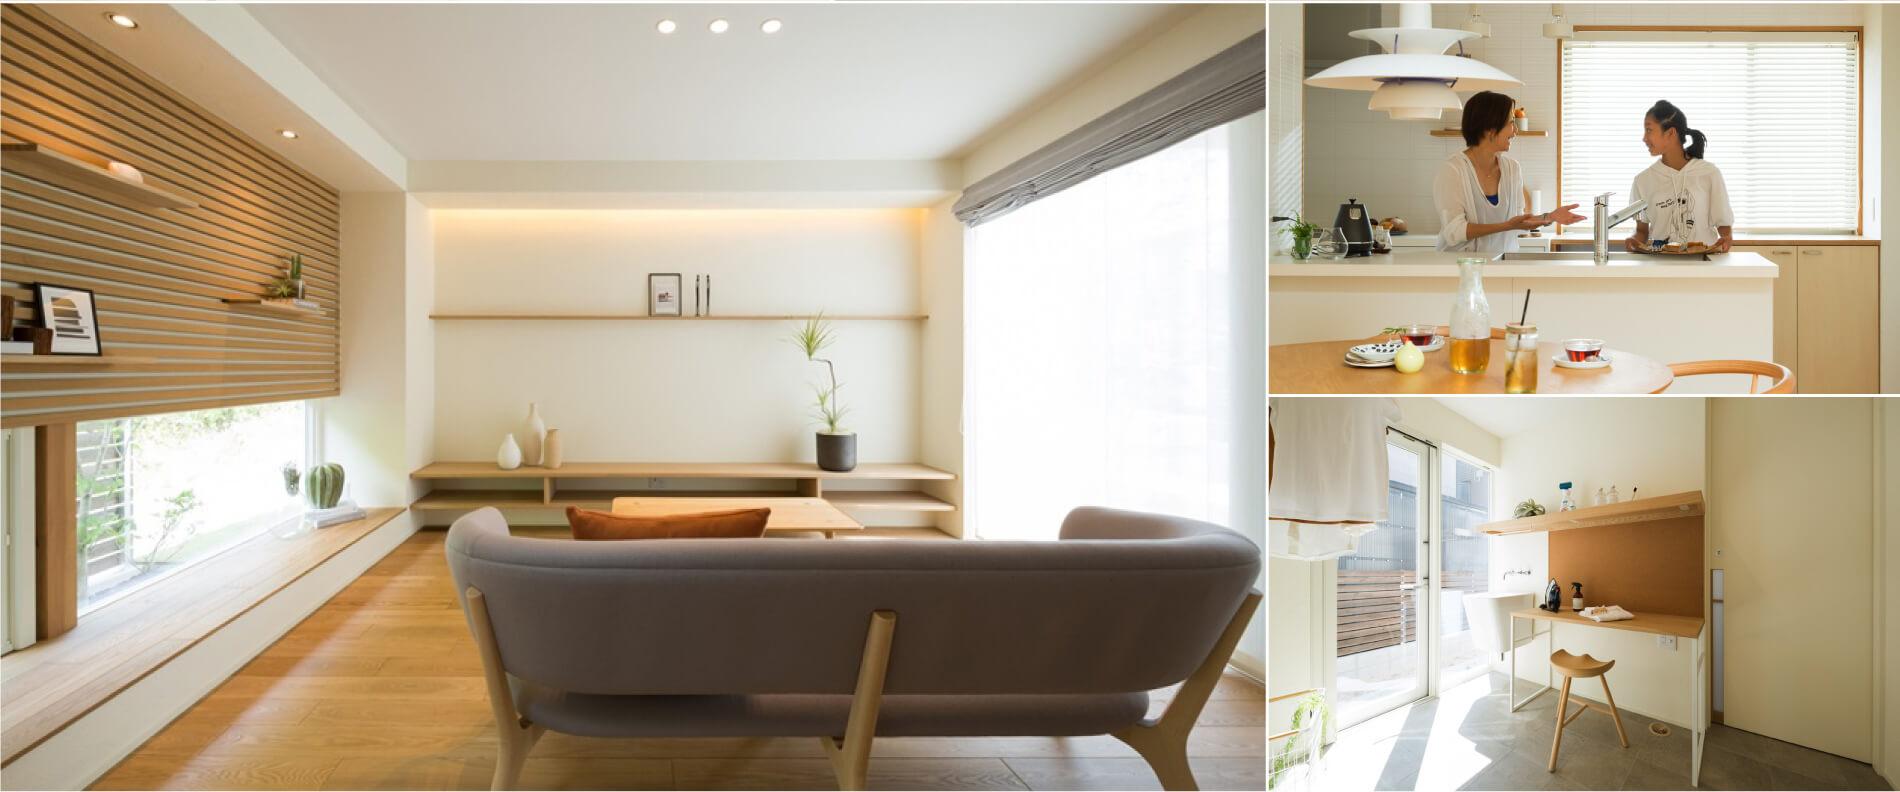 concept2 | 岩国市で新築一戸建てならネストハウス